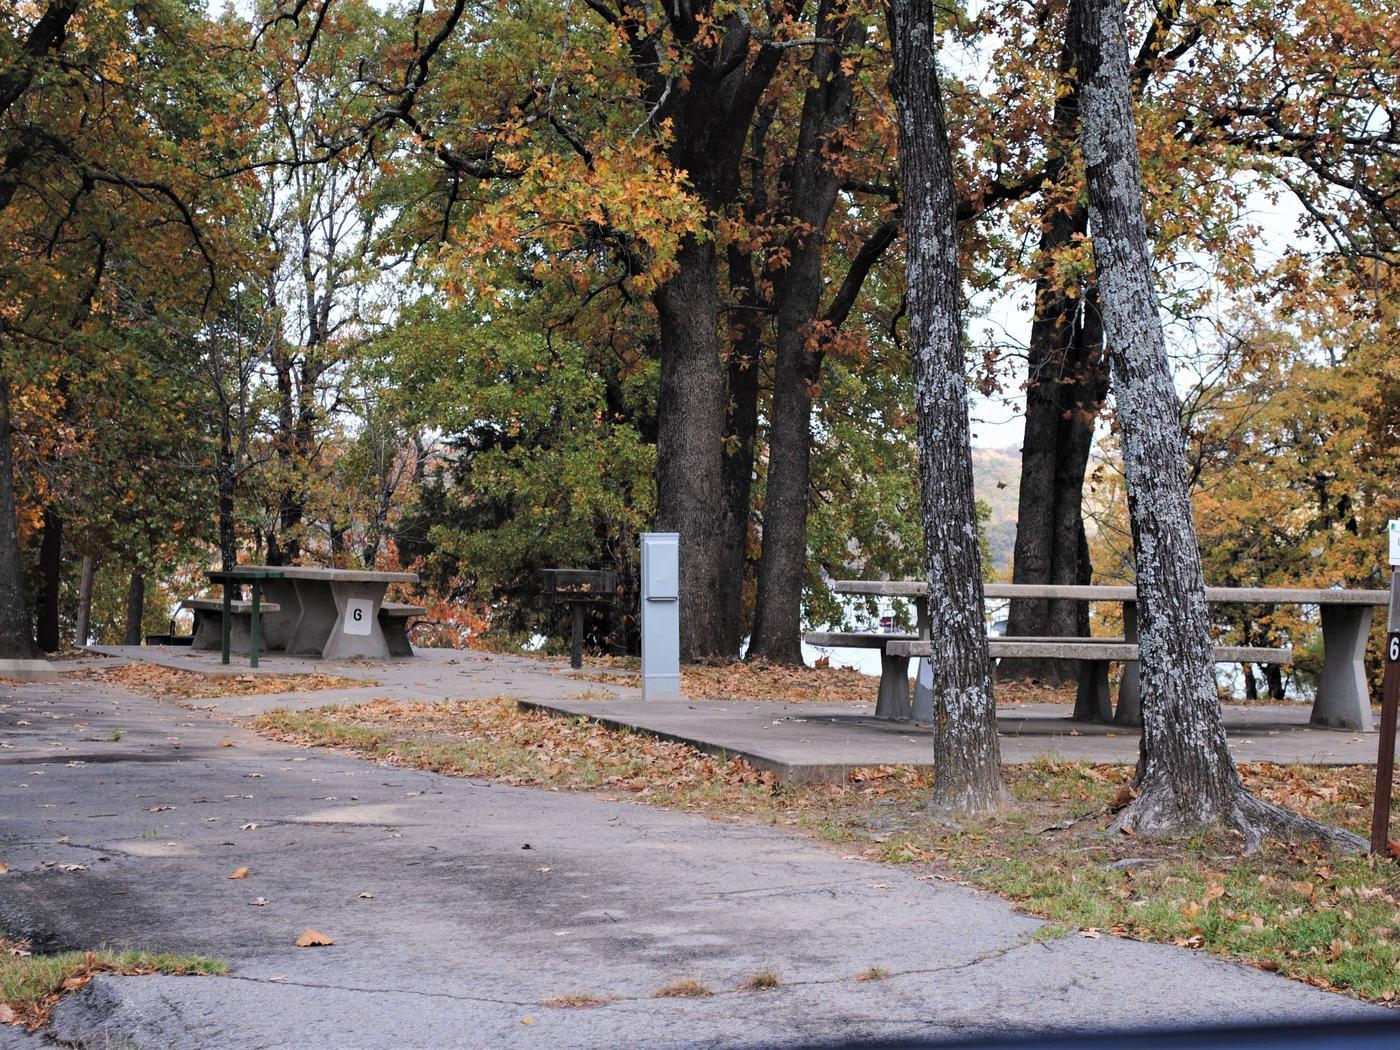 Highway 9 North Campsite #6Campsite N06